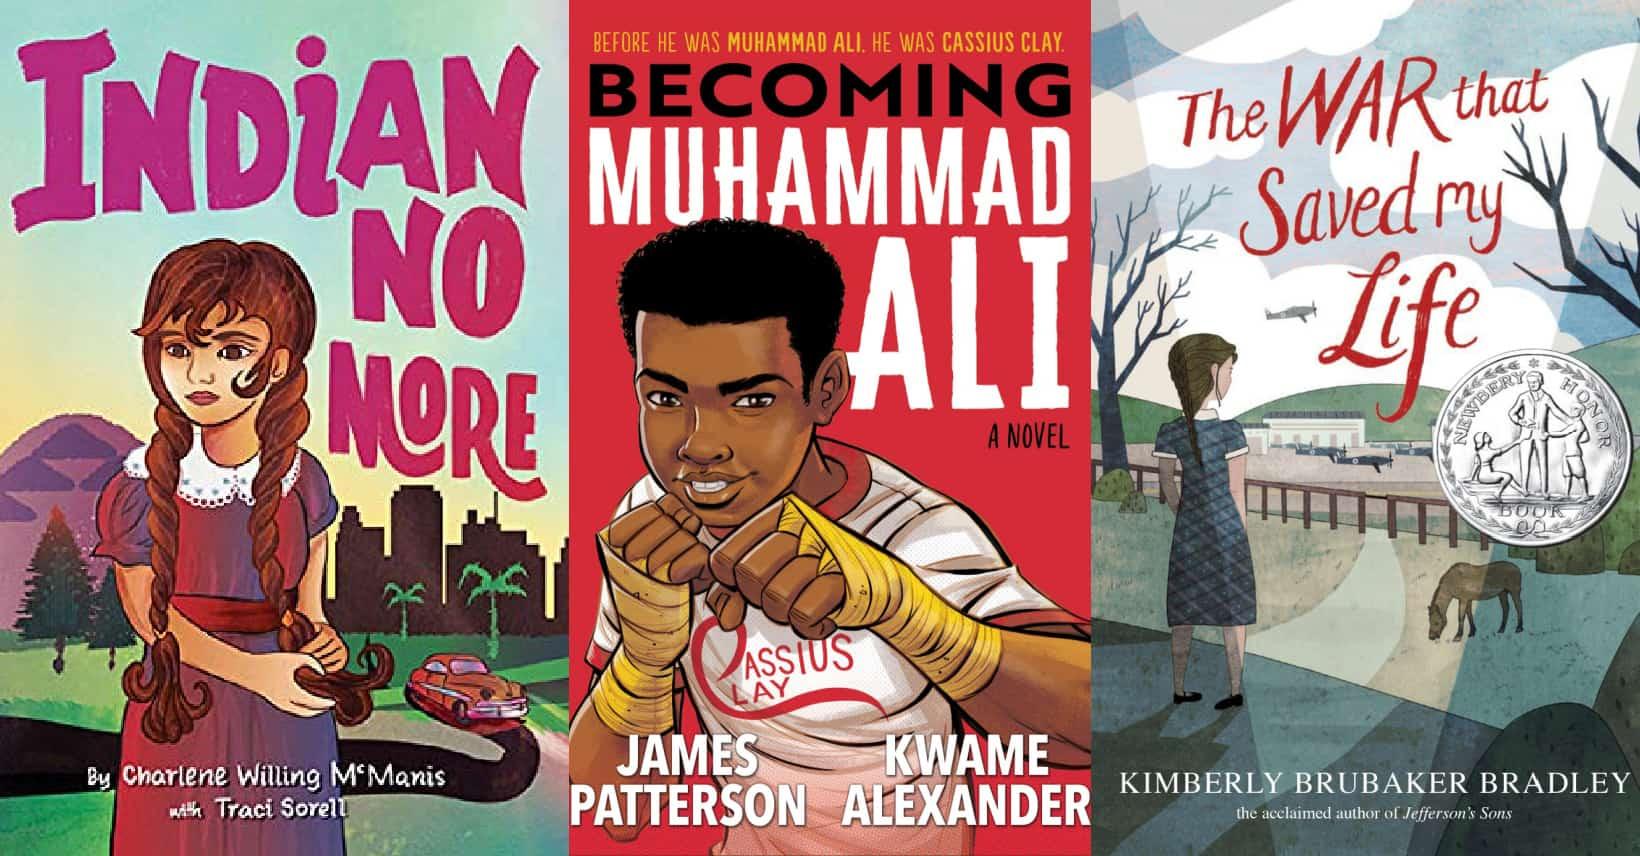 6th grade summer reading historical fiction